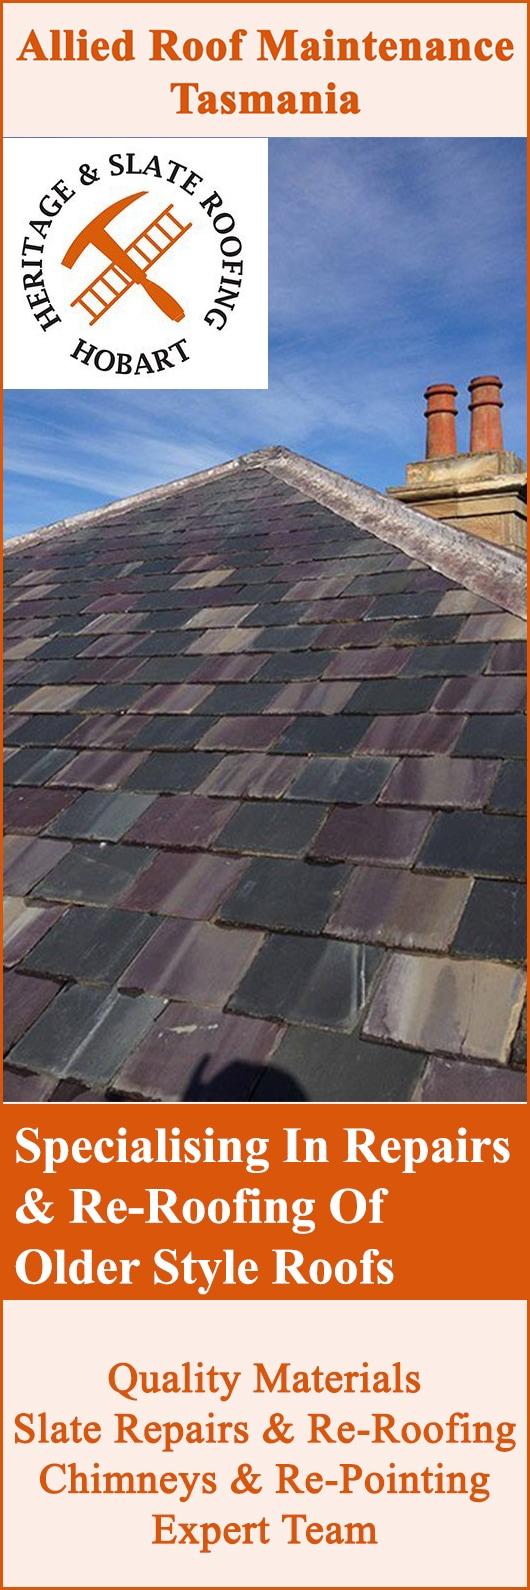 Allied Roof Maintenance Tasmania Roof Restoration Repairs Battery Point